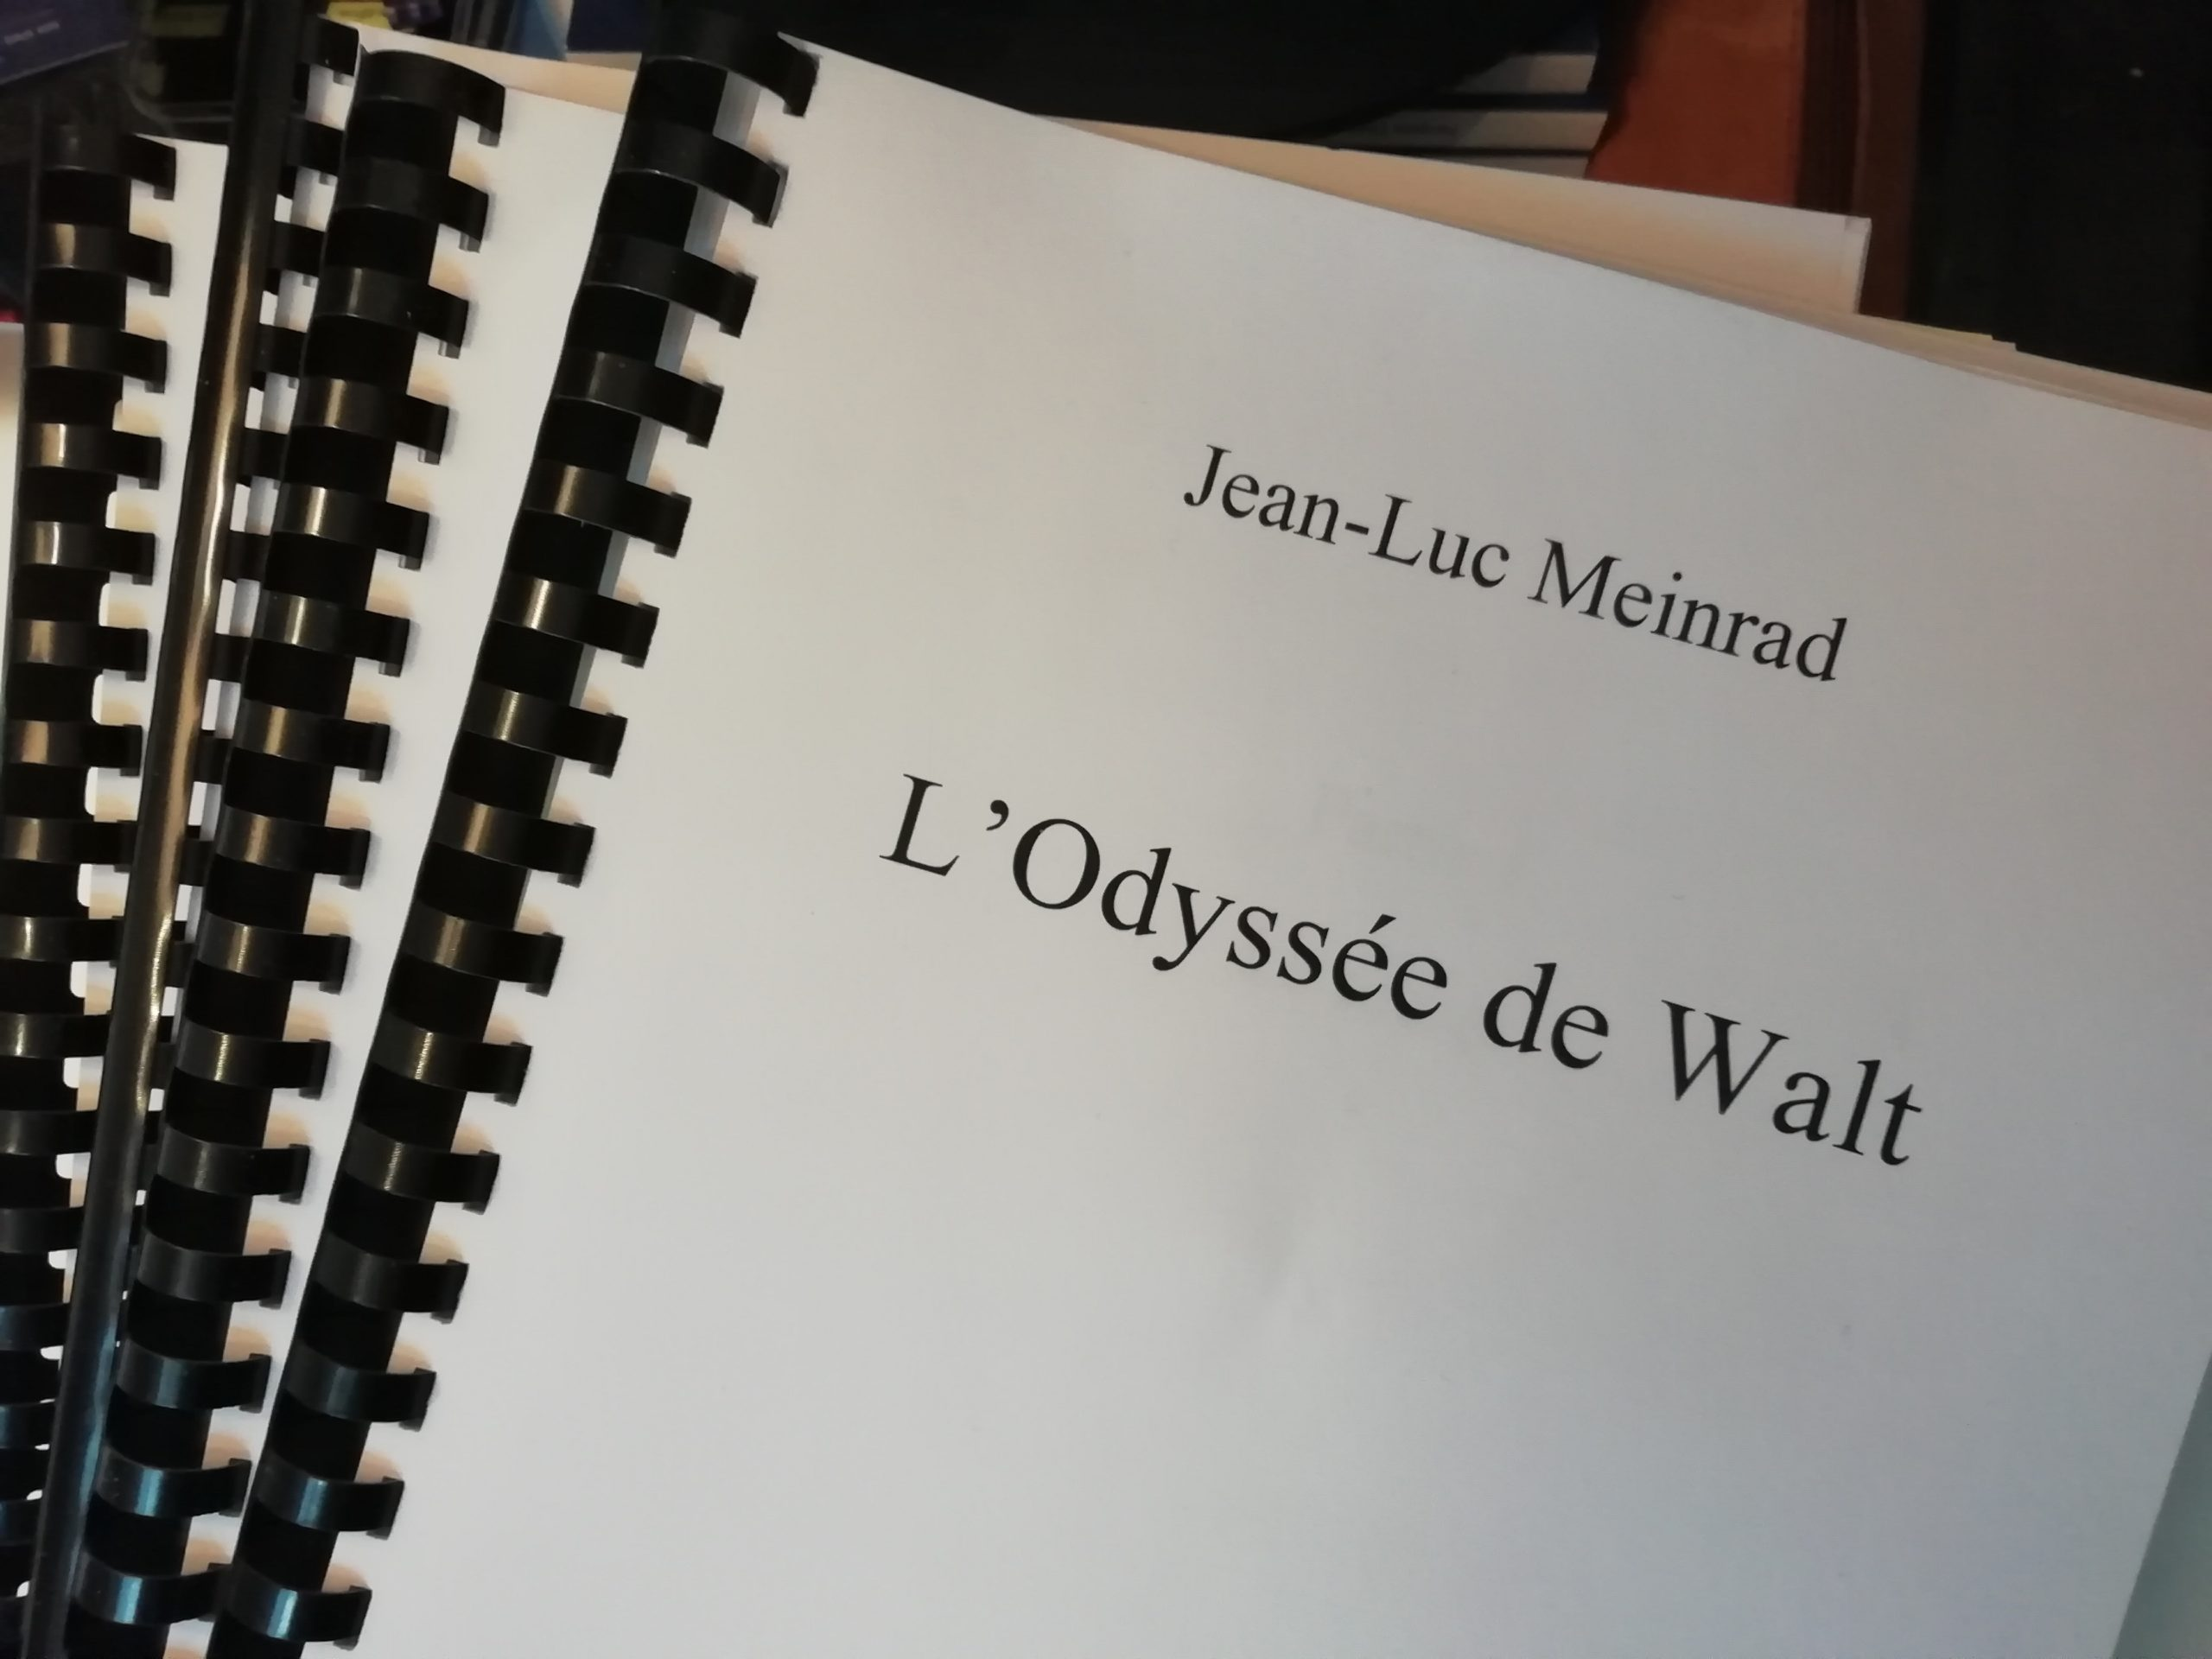 Manuscrit de L'Odyssée de Walt